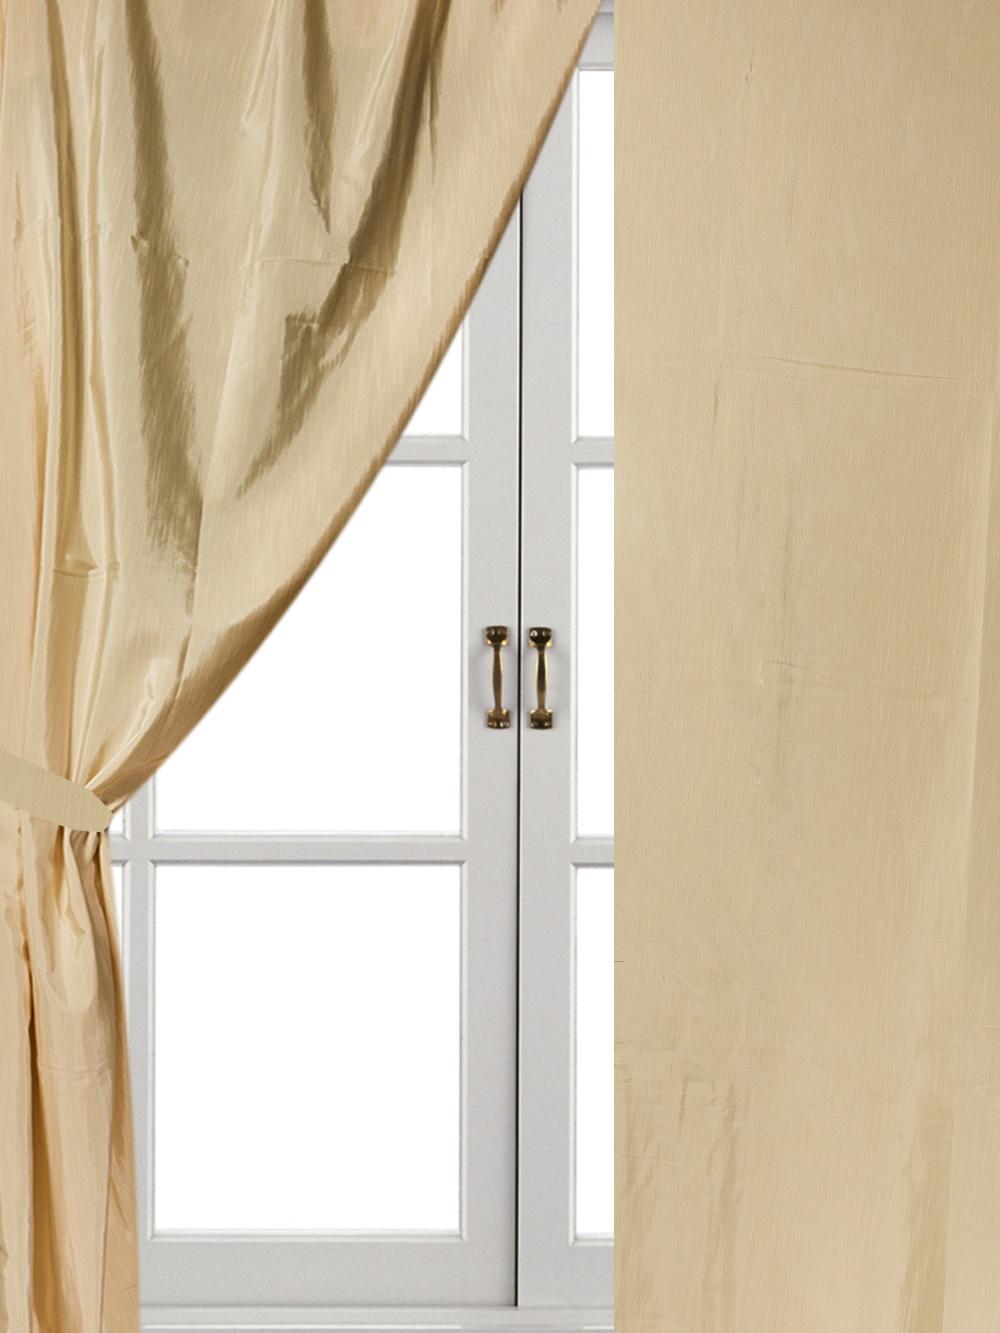 Комплект штор Айлант А25, бежевый шторы для комнаты tomdom комплект штор тризи бежевый